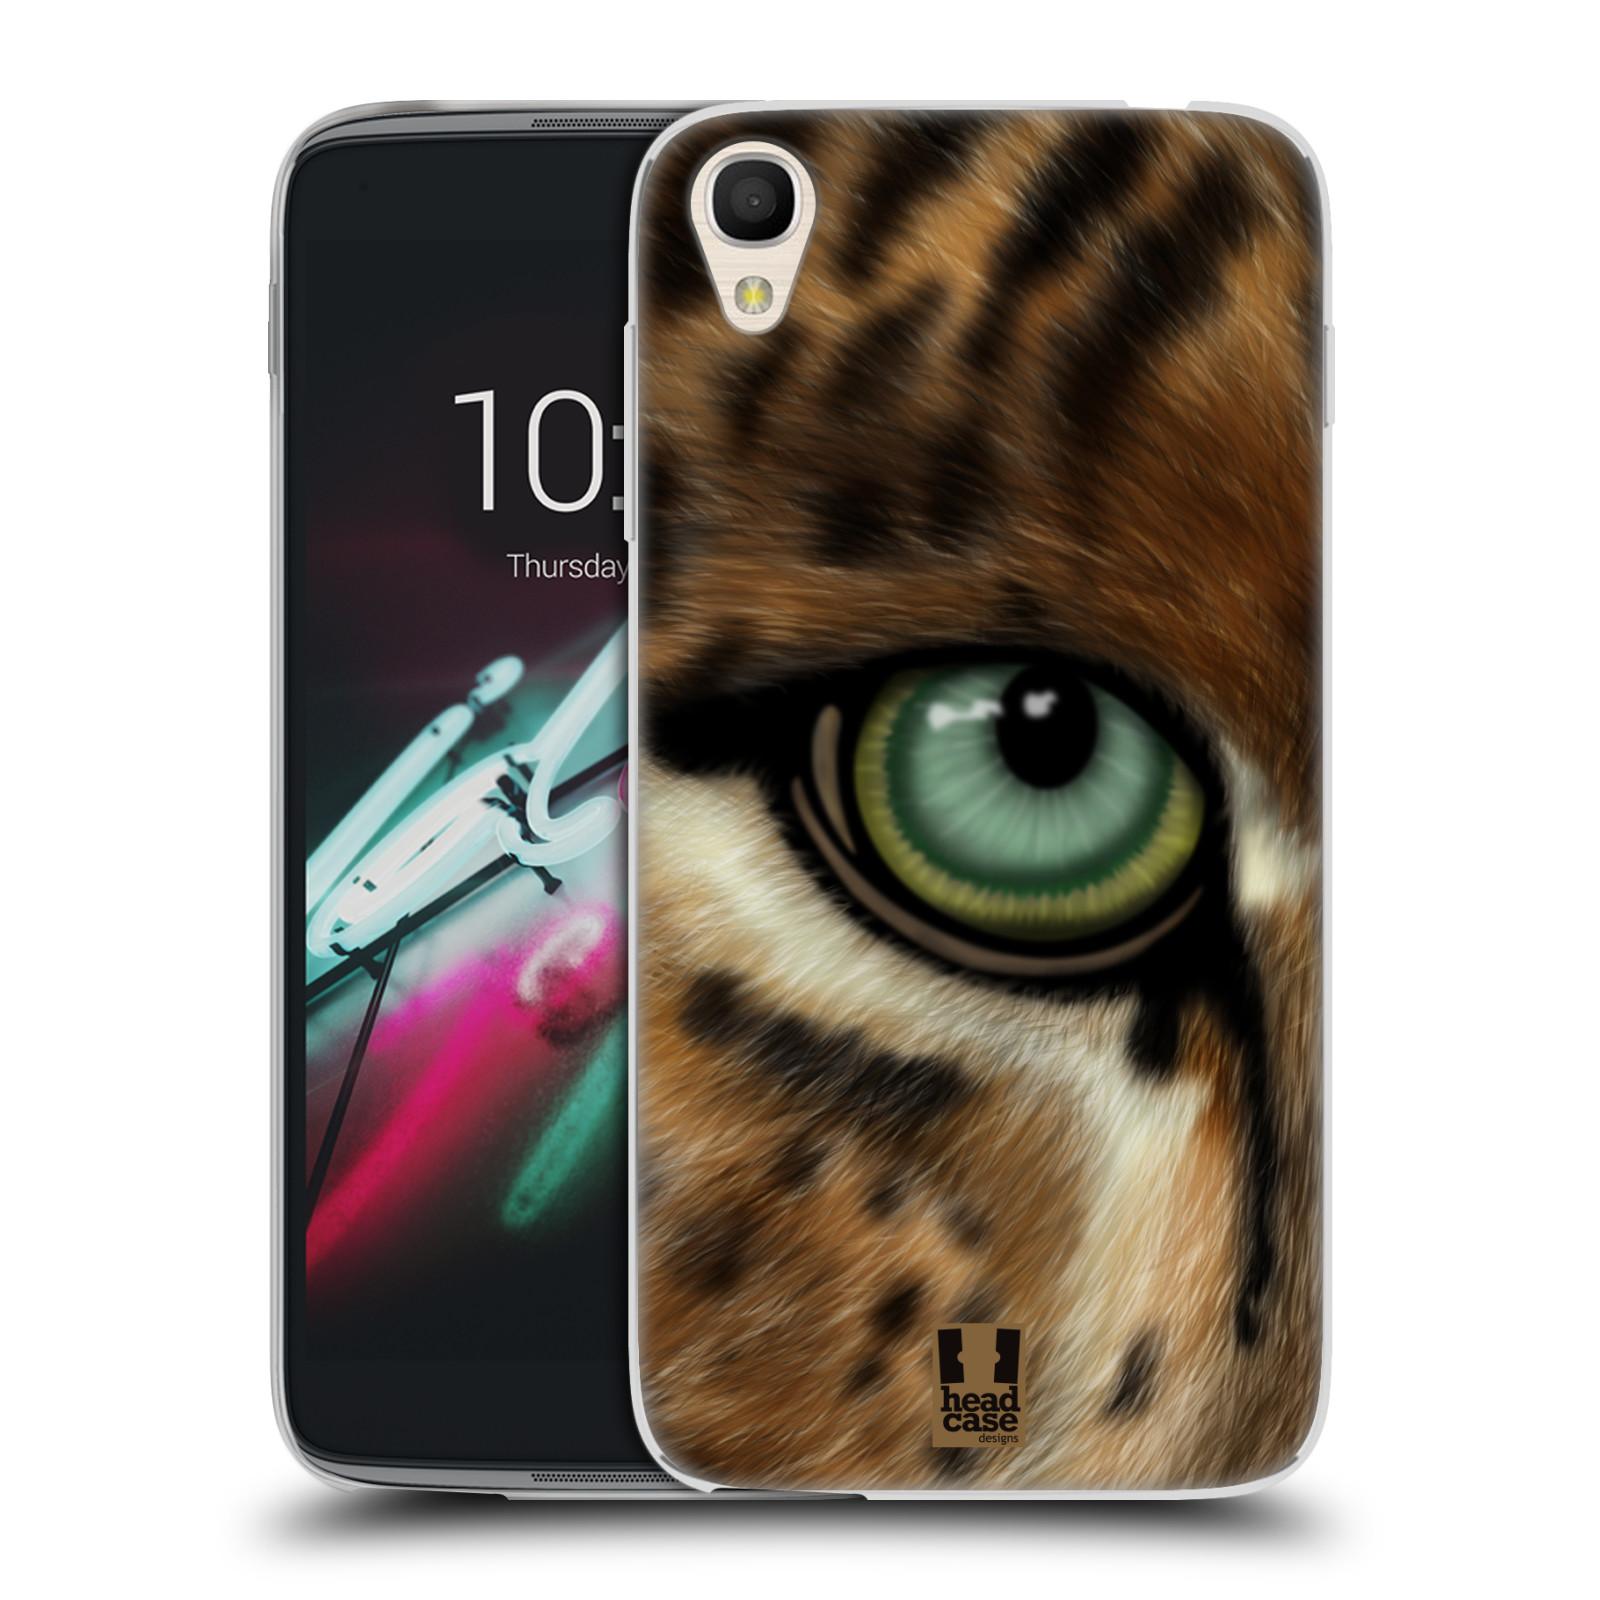 HEAD CASE silikonový obal na mobil Alcatel Idol 3 OT-6039Y (4.7) vzor pohled zvířete oko leopard